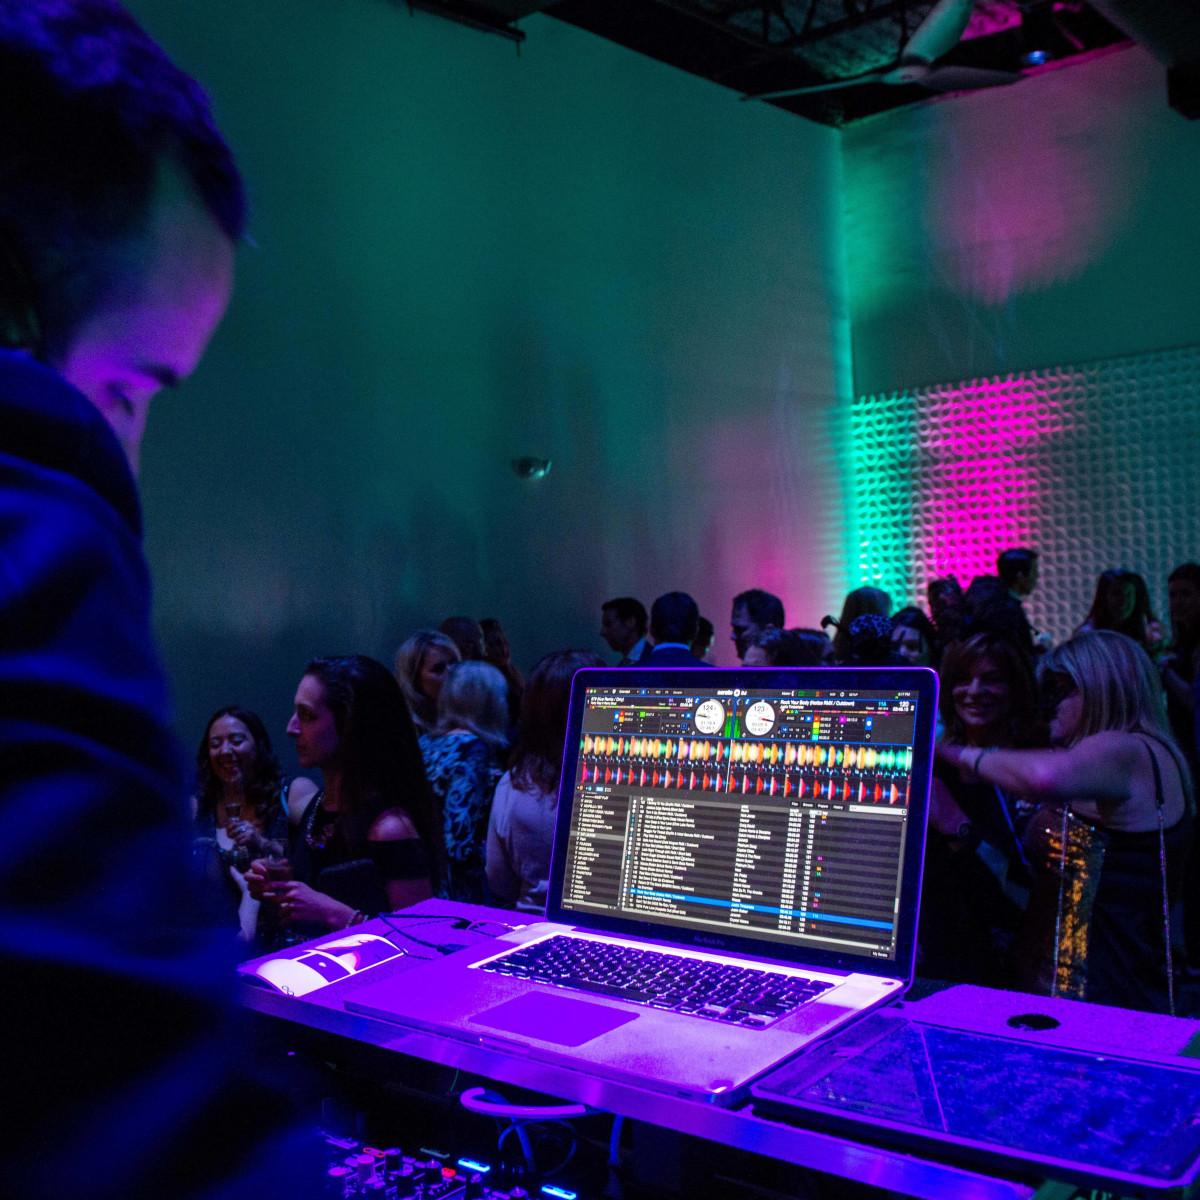 Houston, RYDE/Rose Foundation event, Oct. 2016, DJ PennyT